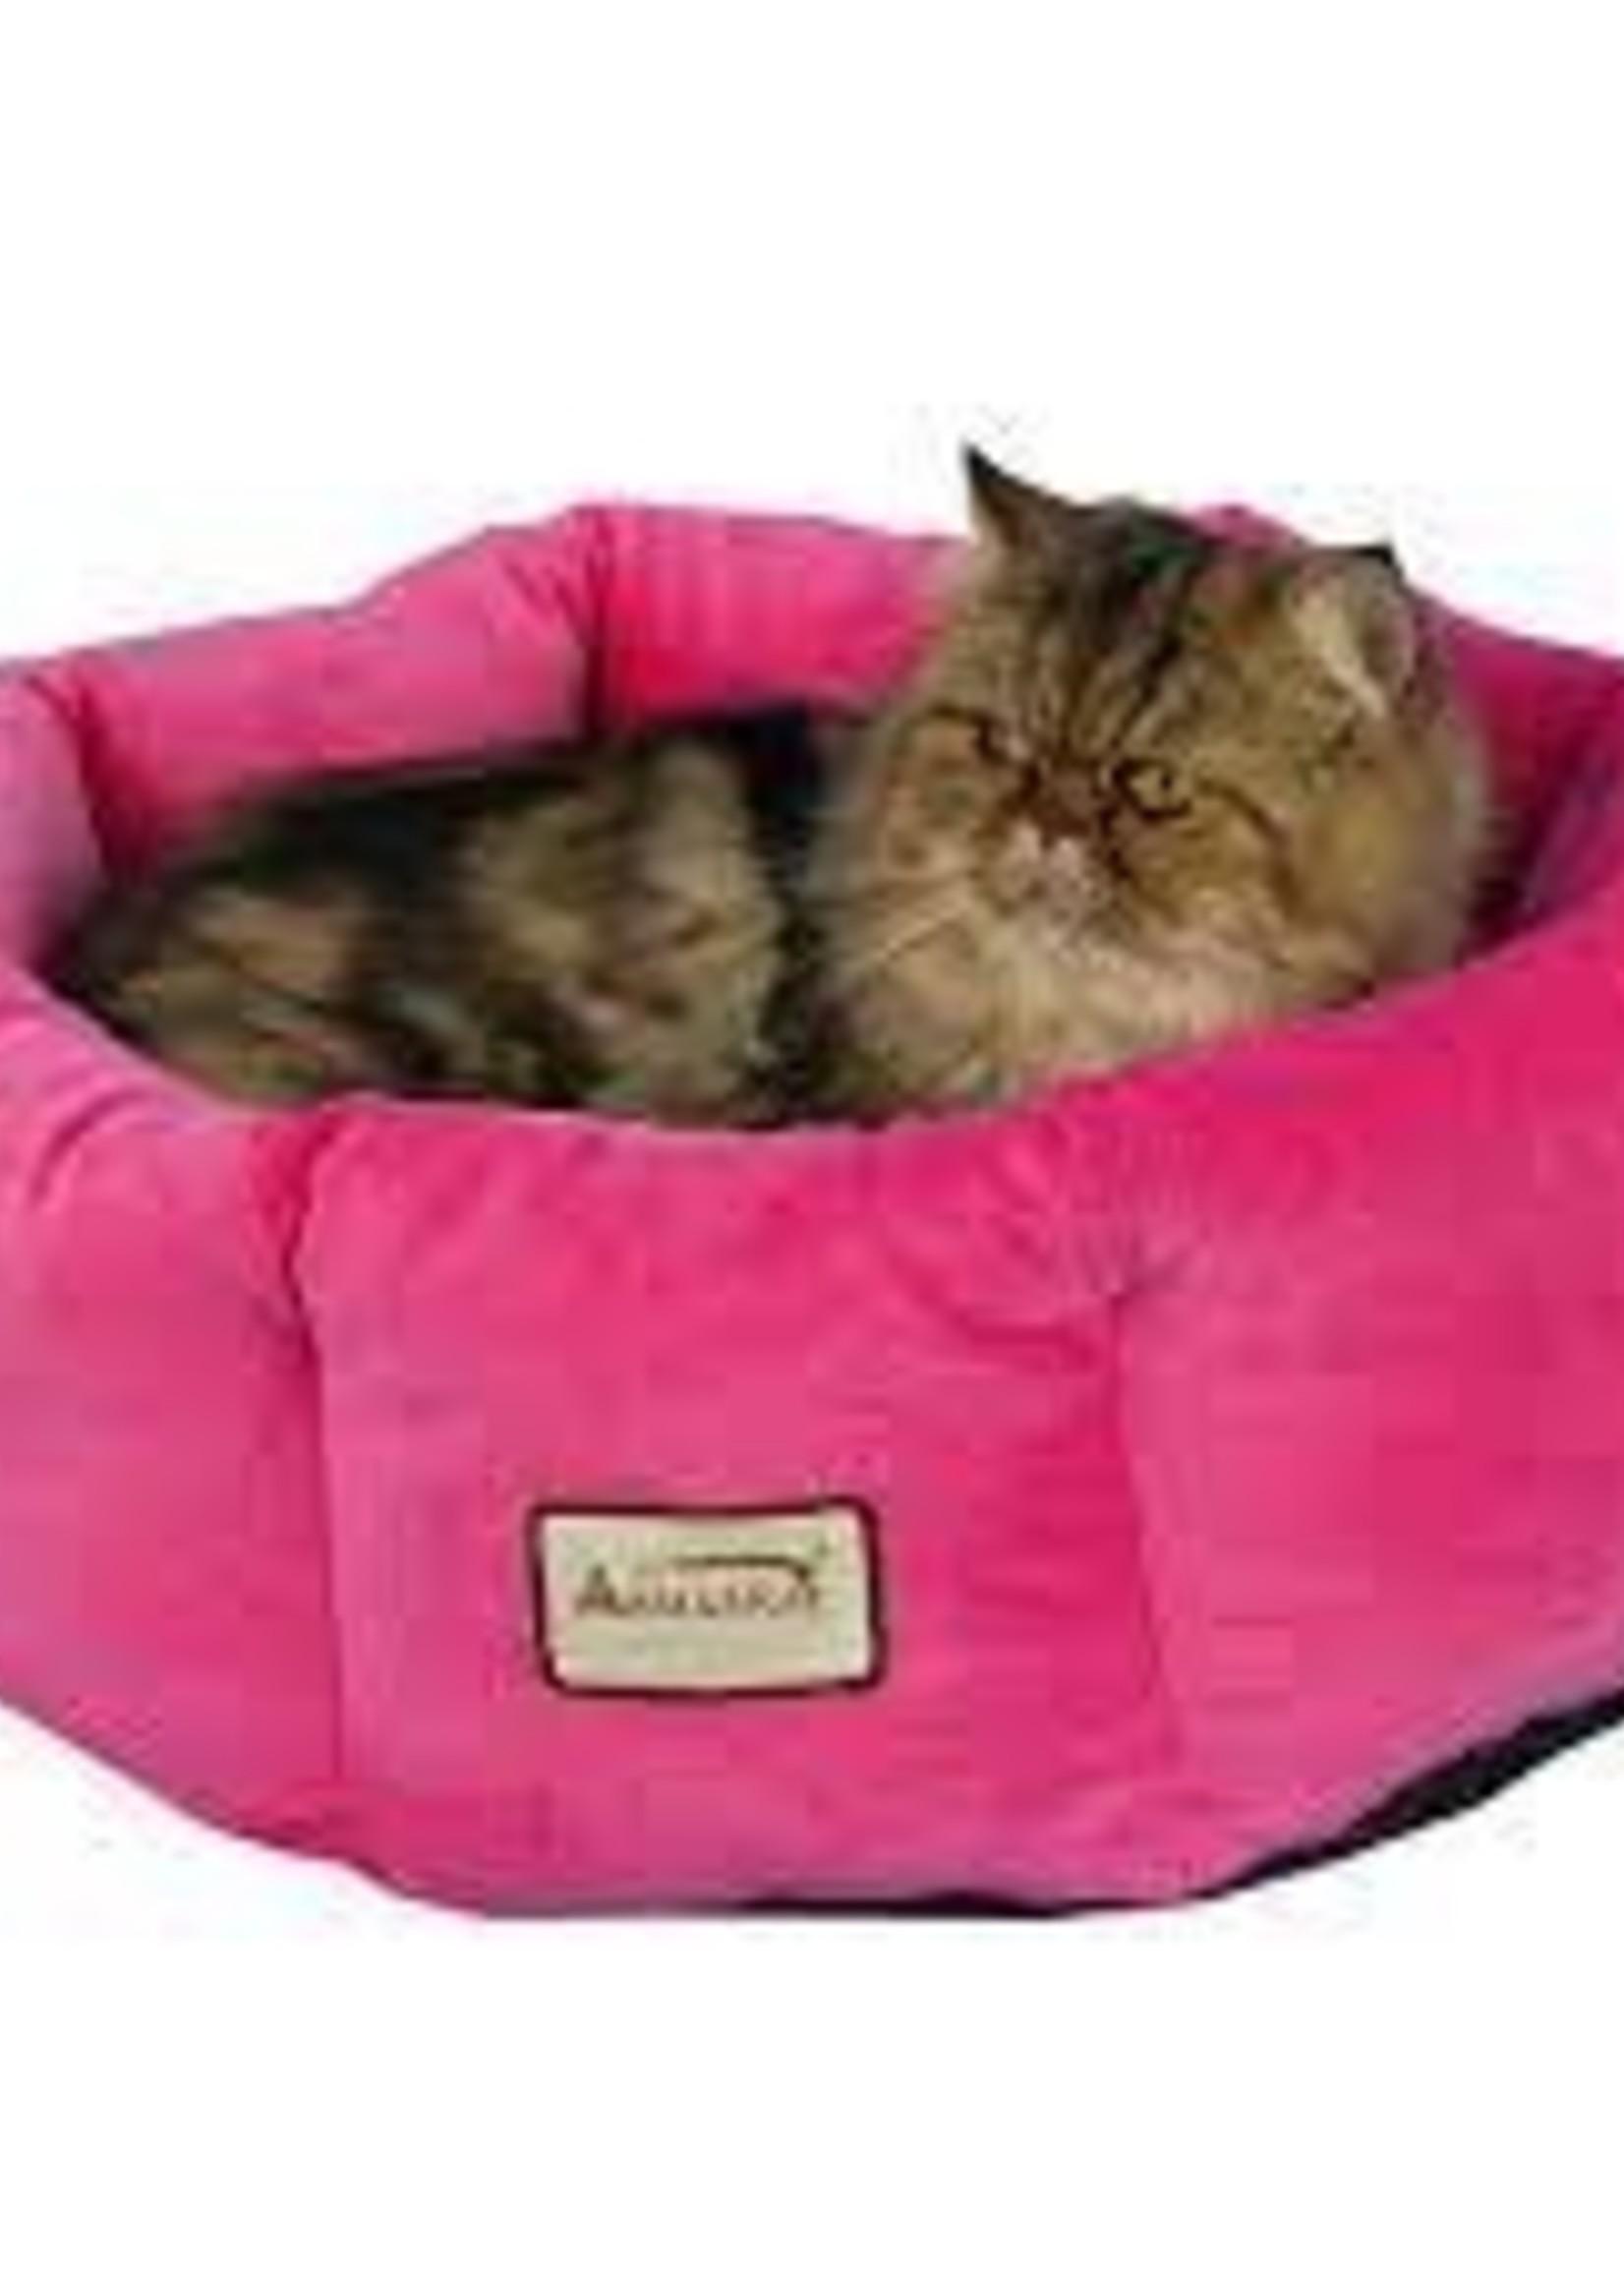 Armarkat Armarkat Cat Bed Warm Pet Cuddle Bed Pink